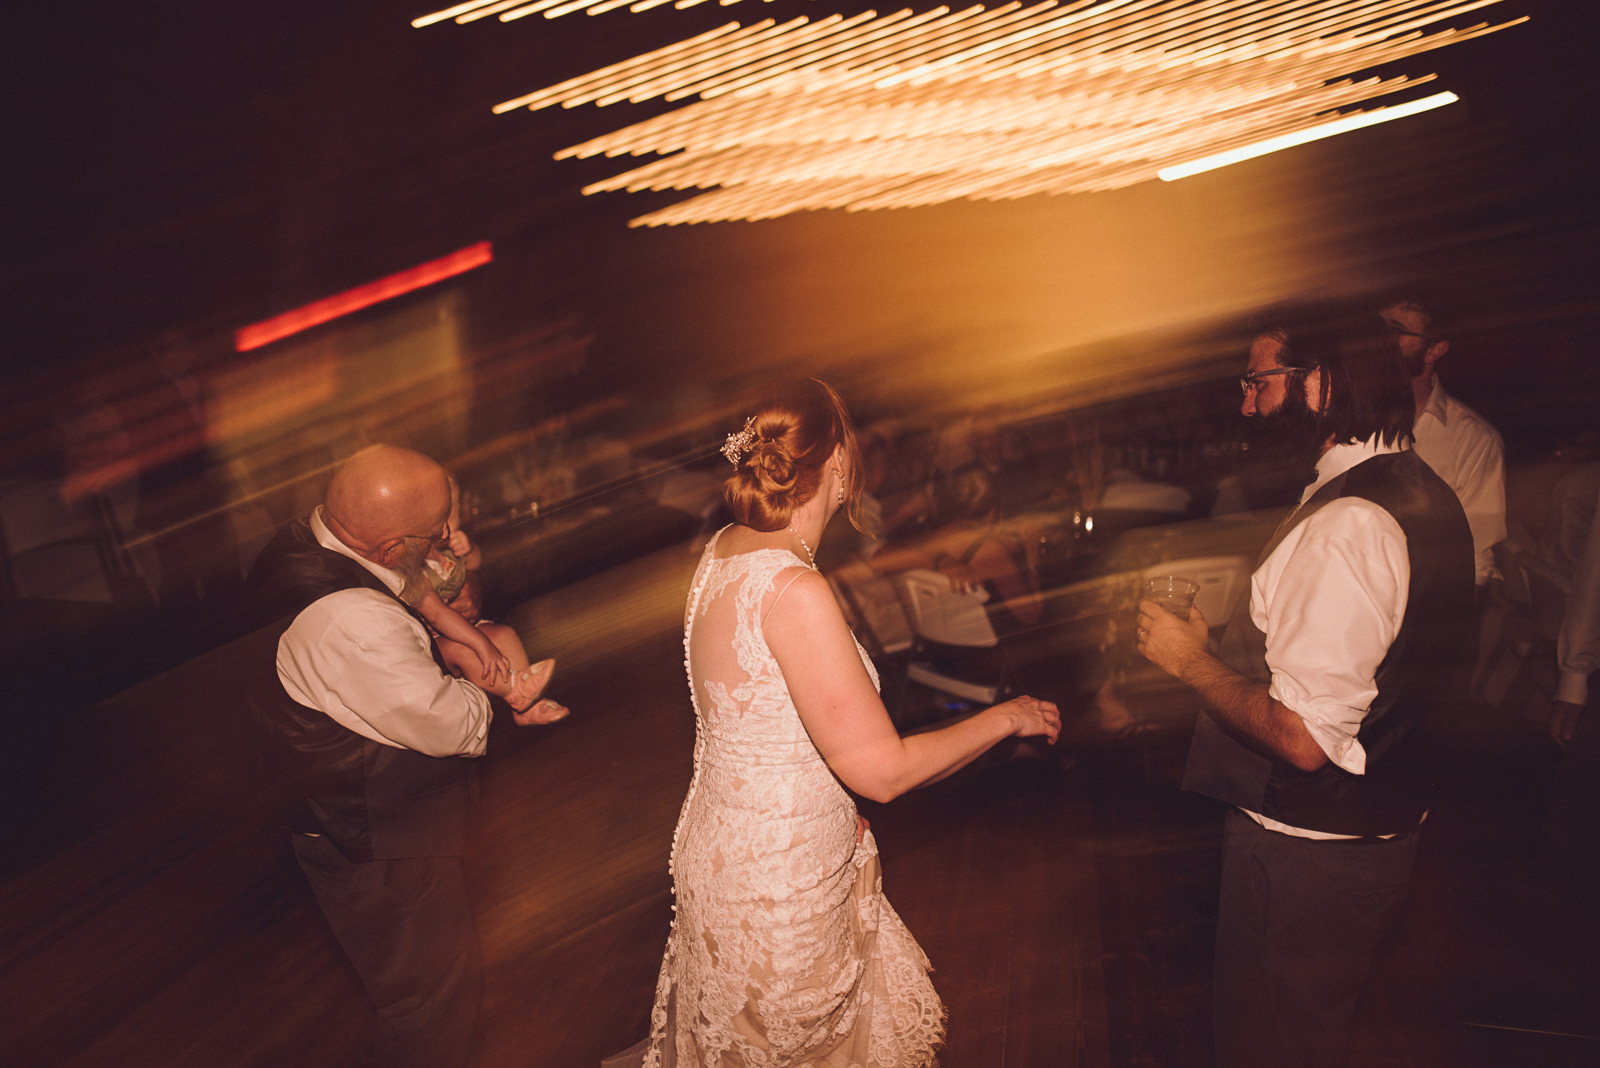 wedding-keely-caleb-2209-name-your-photo.jpg